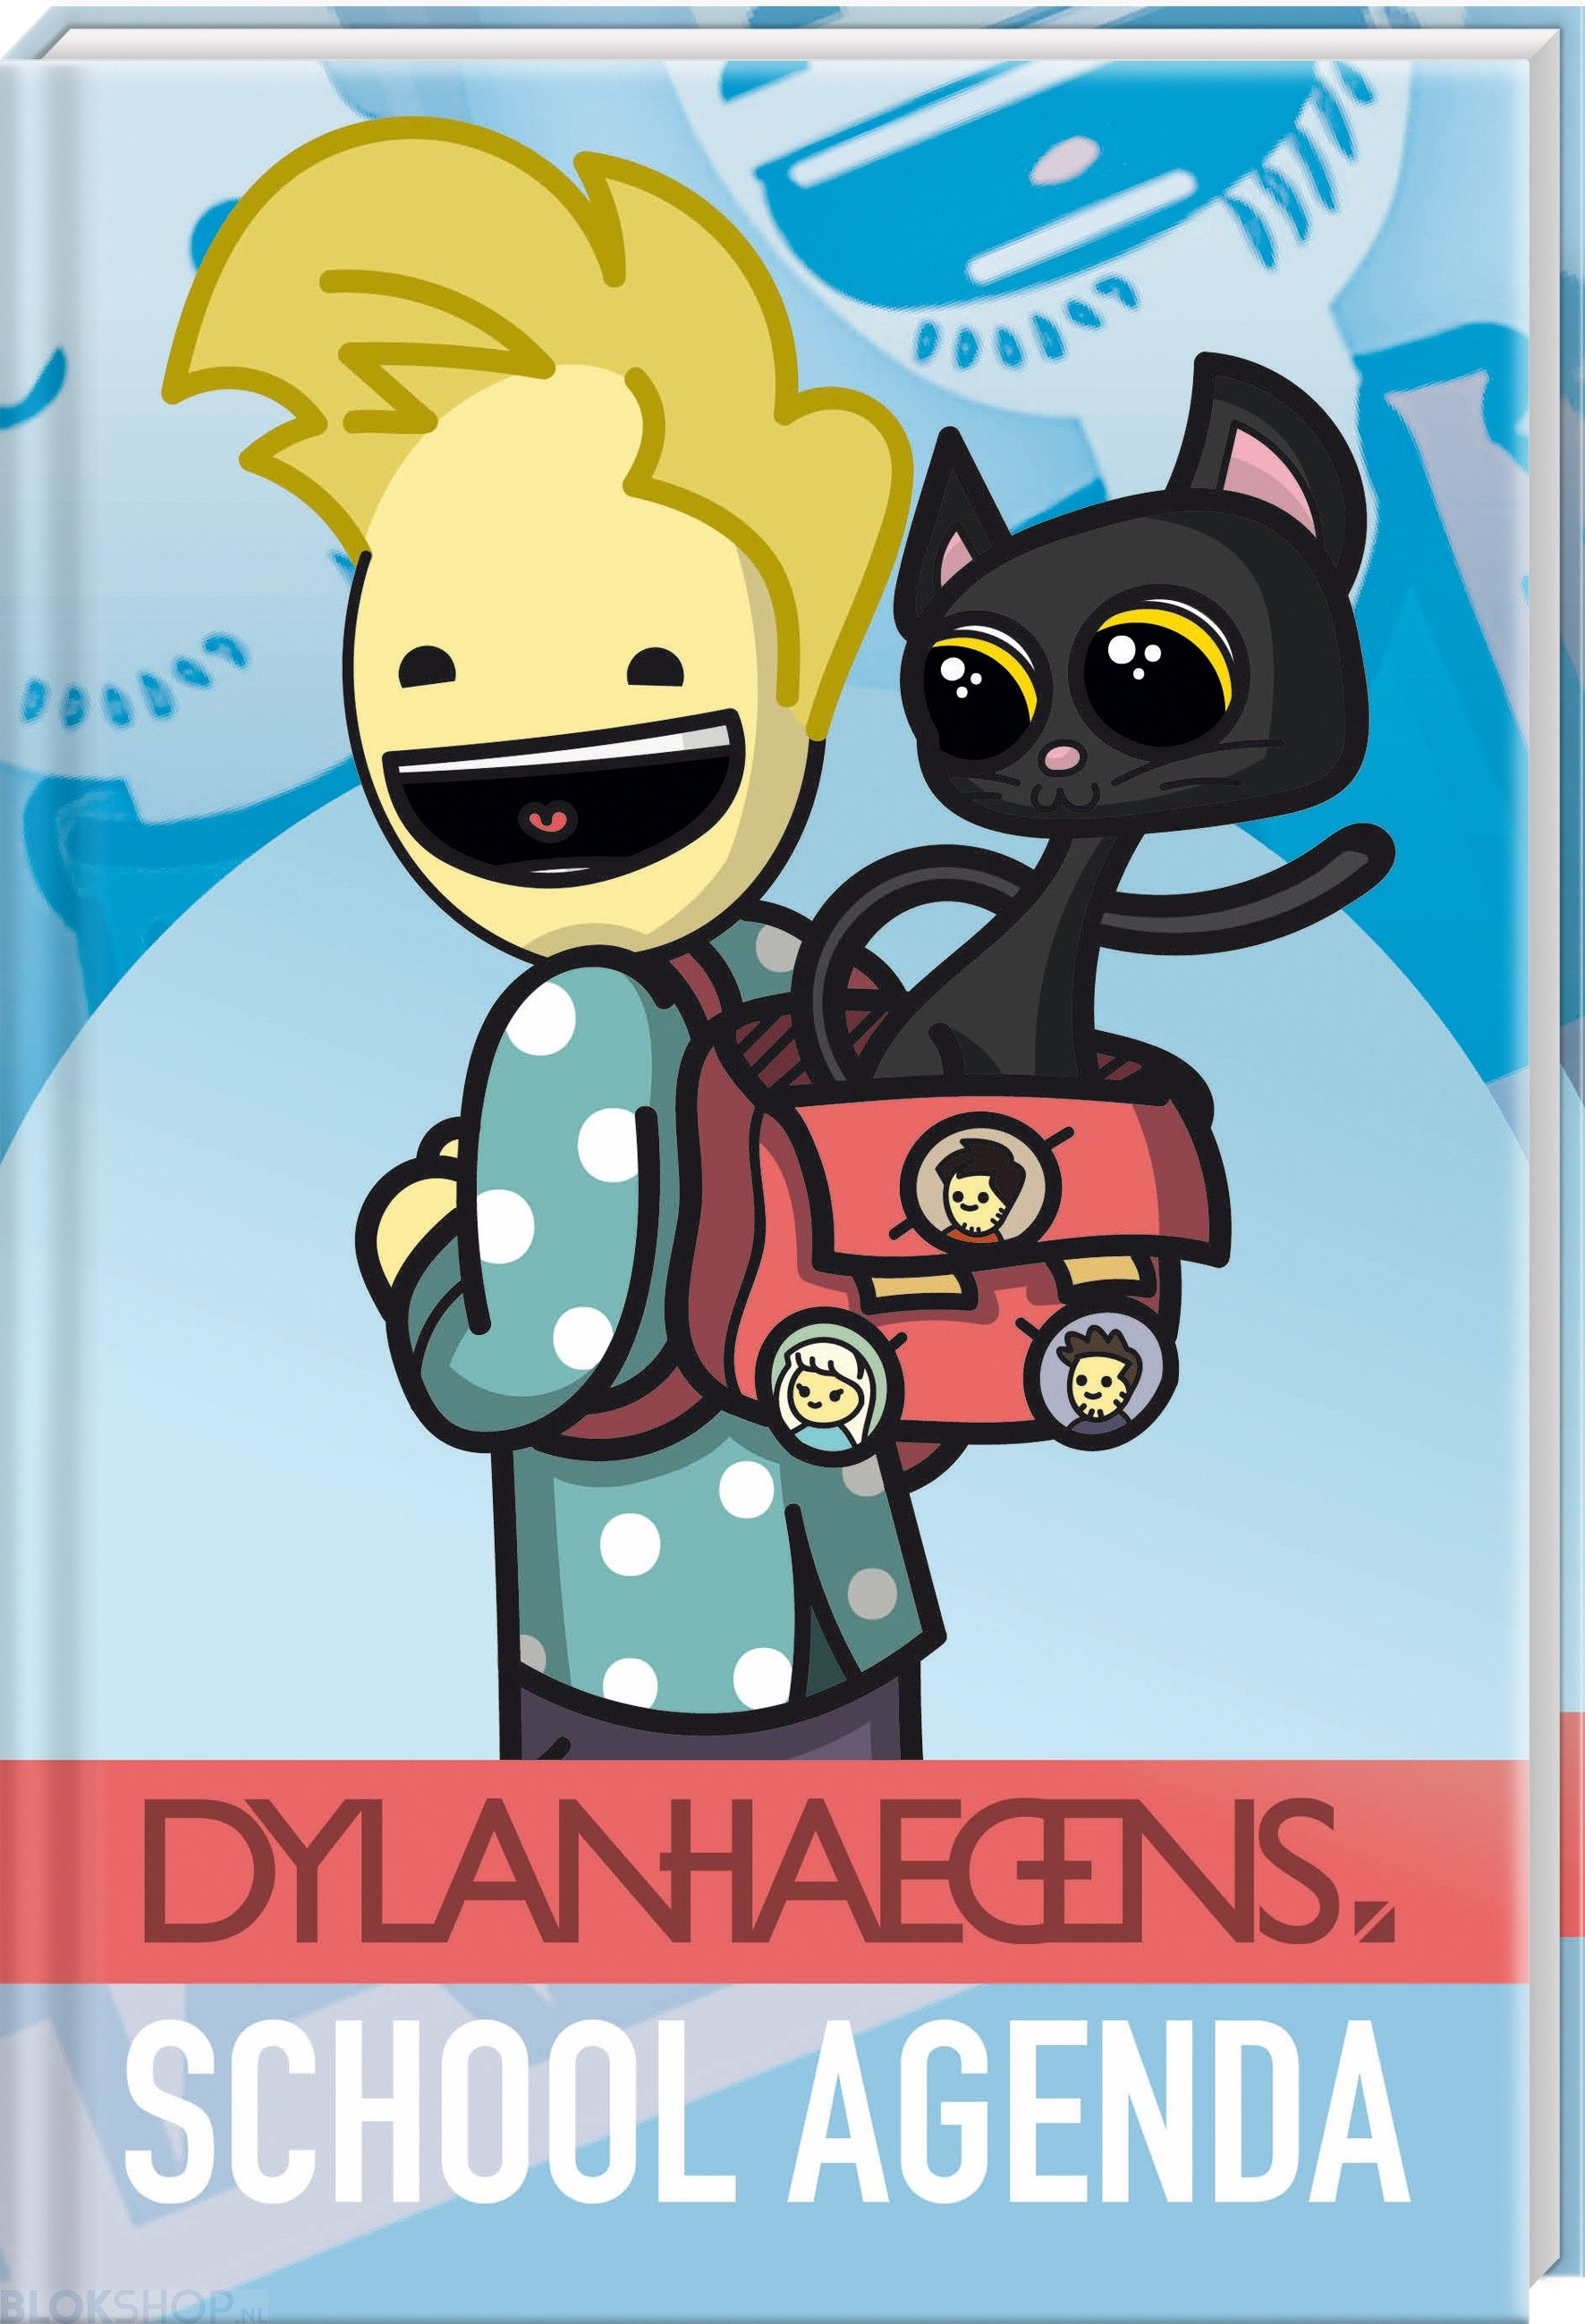 Dylan Haegens Youtube Schoolagenda 2016 2017 Schoolagenda Youtube Animatie